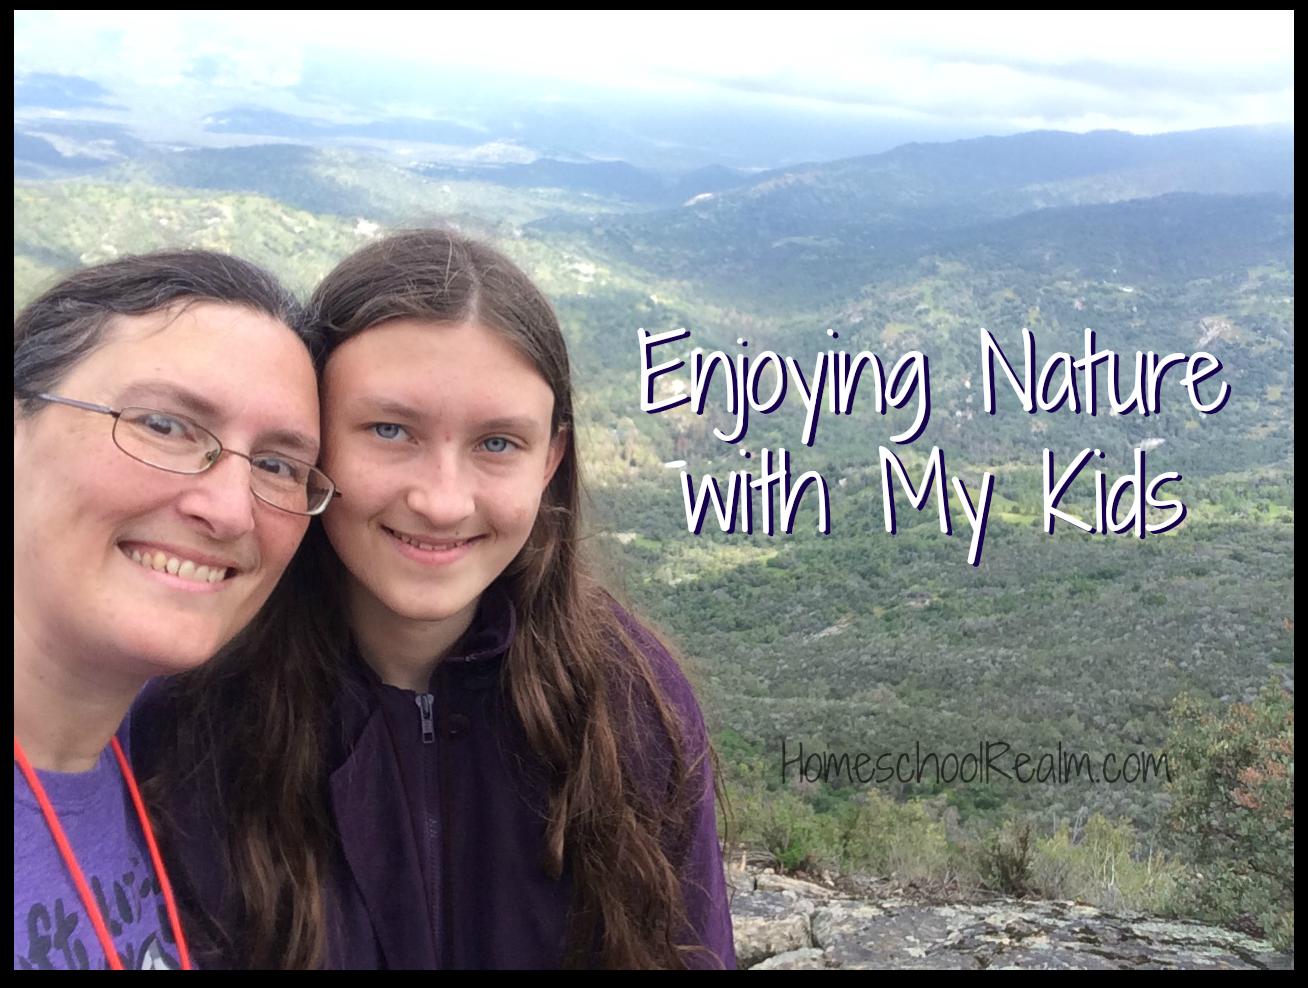 Enjoying nature with my kids